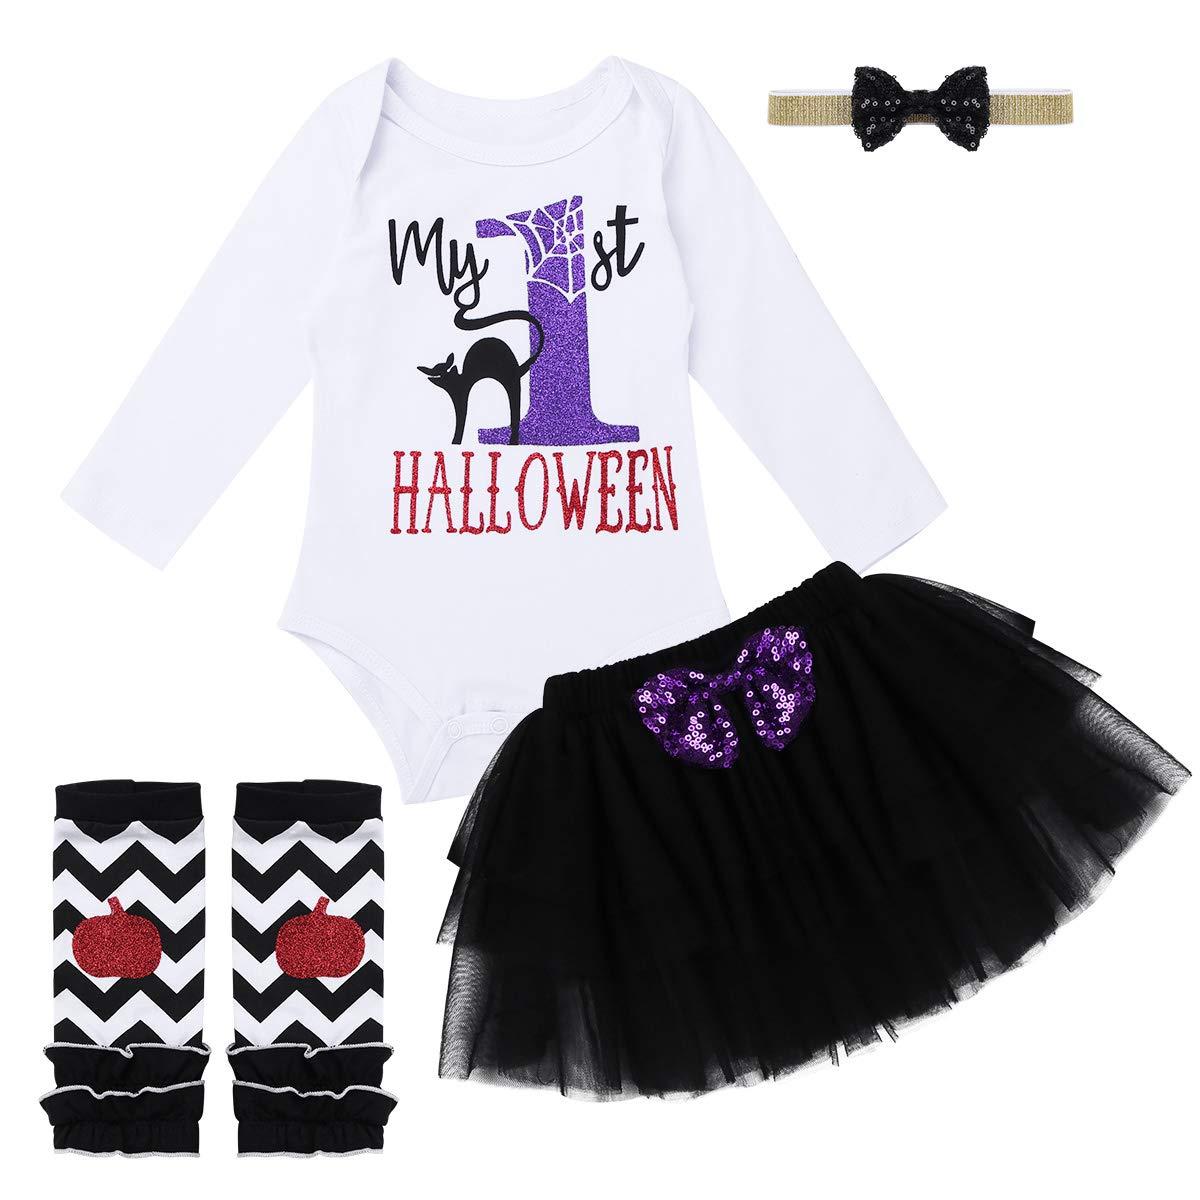 FEESHOW Baby Girls My 1st Halloween Outfit Costumes Romper Bodysuit Tutu Skirt Headband Set Black 5 pcs Set 0-3 Months